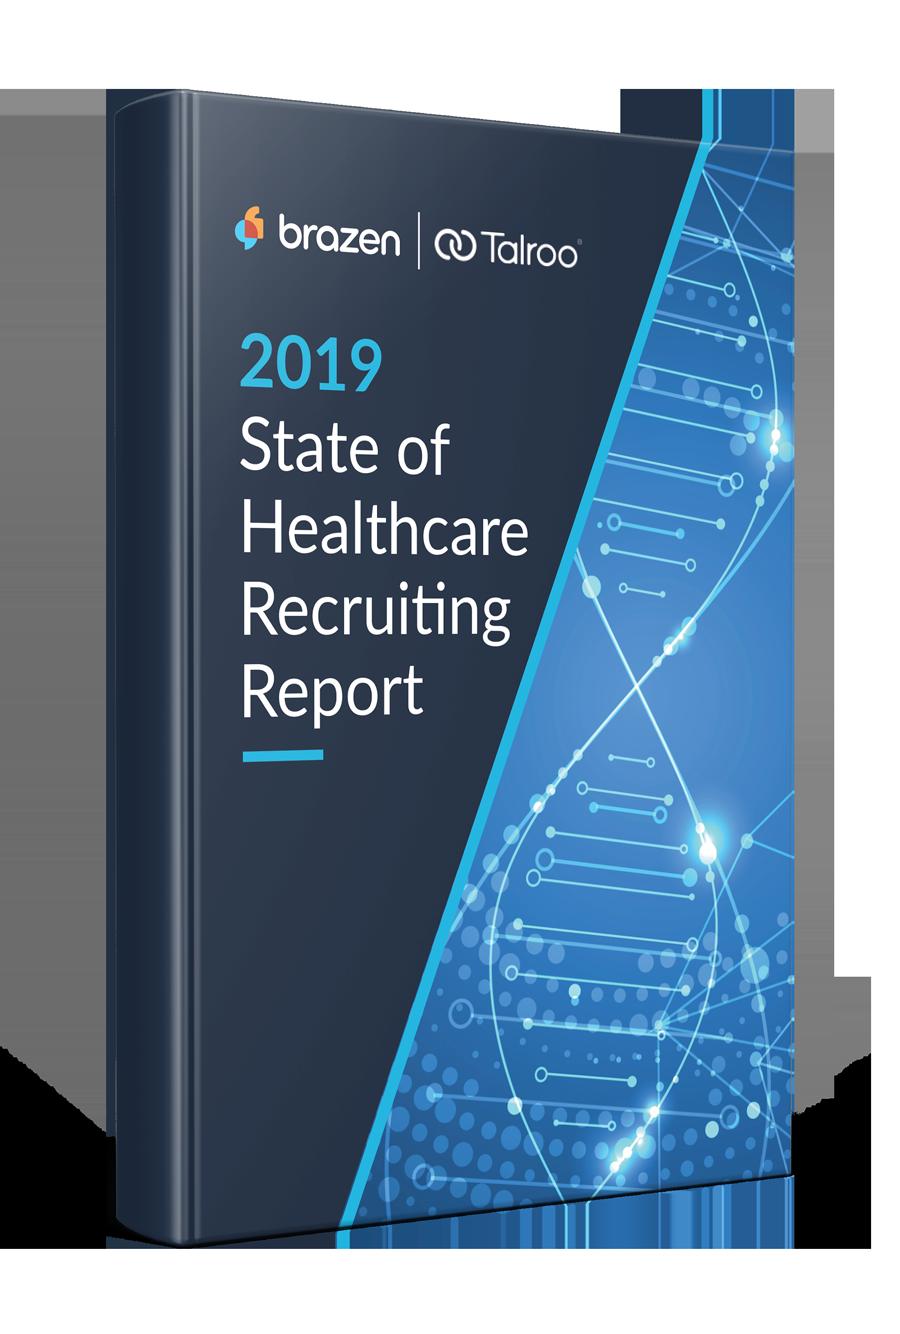 Brazen-P11-Healthcare-ebook_6x9-cover-mockup